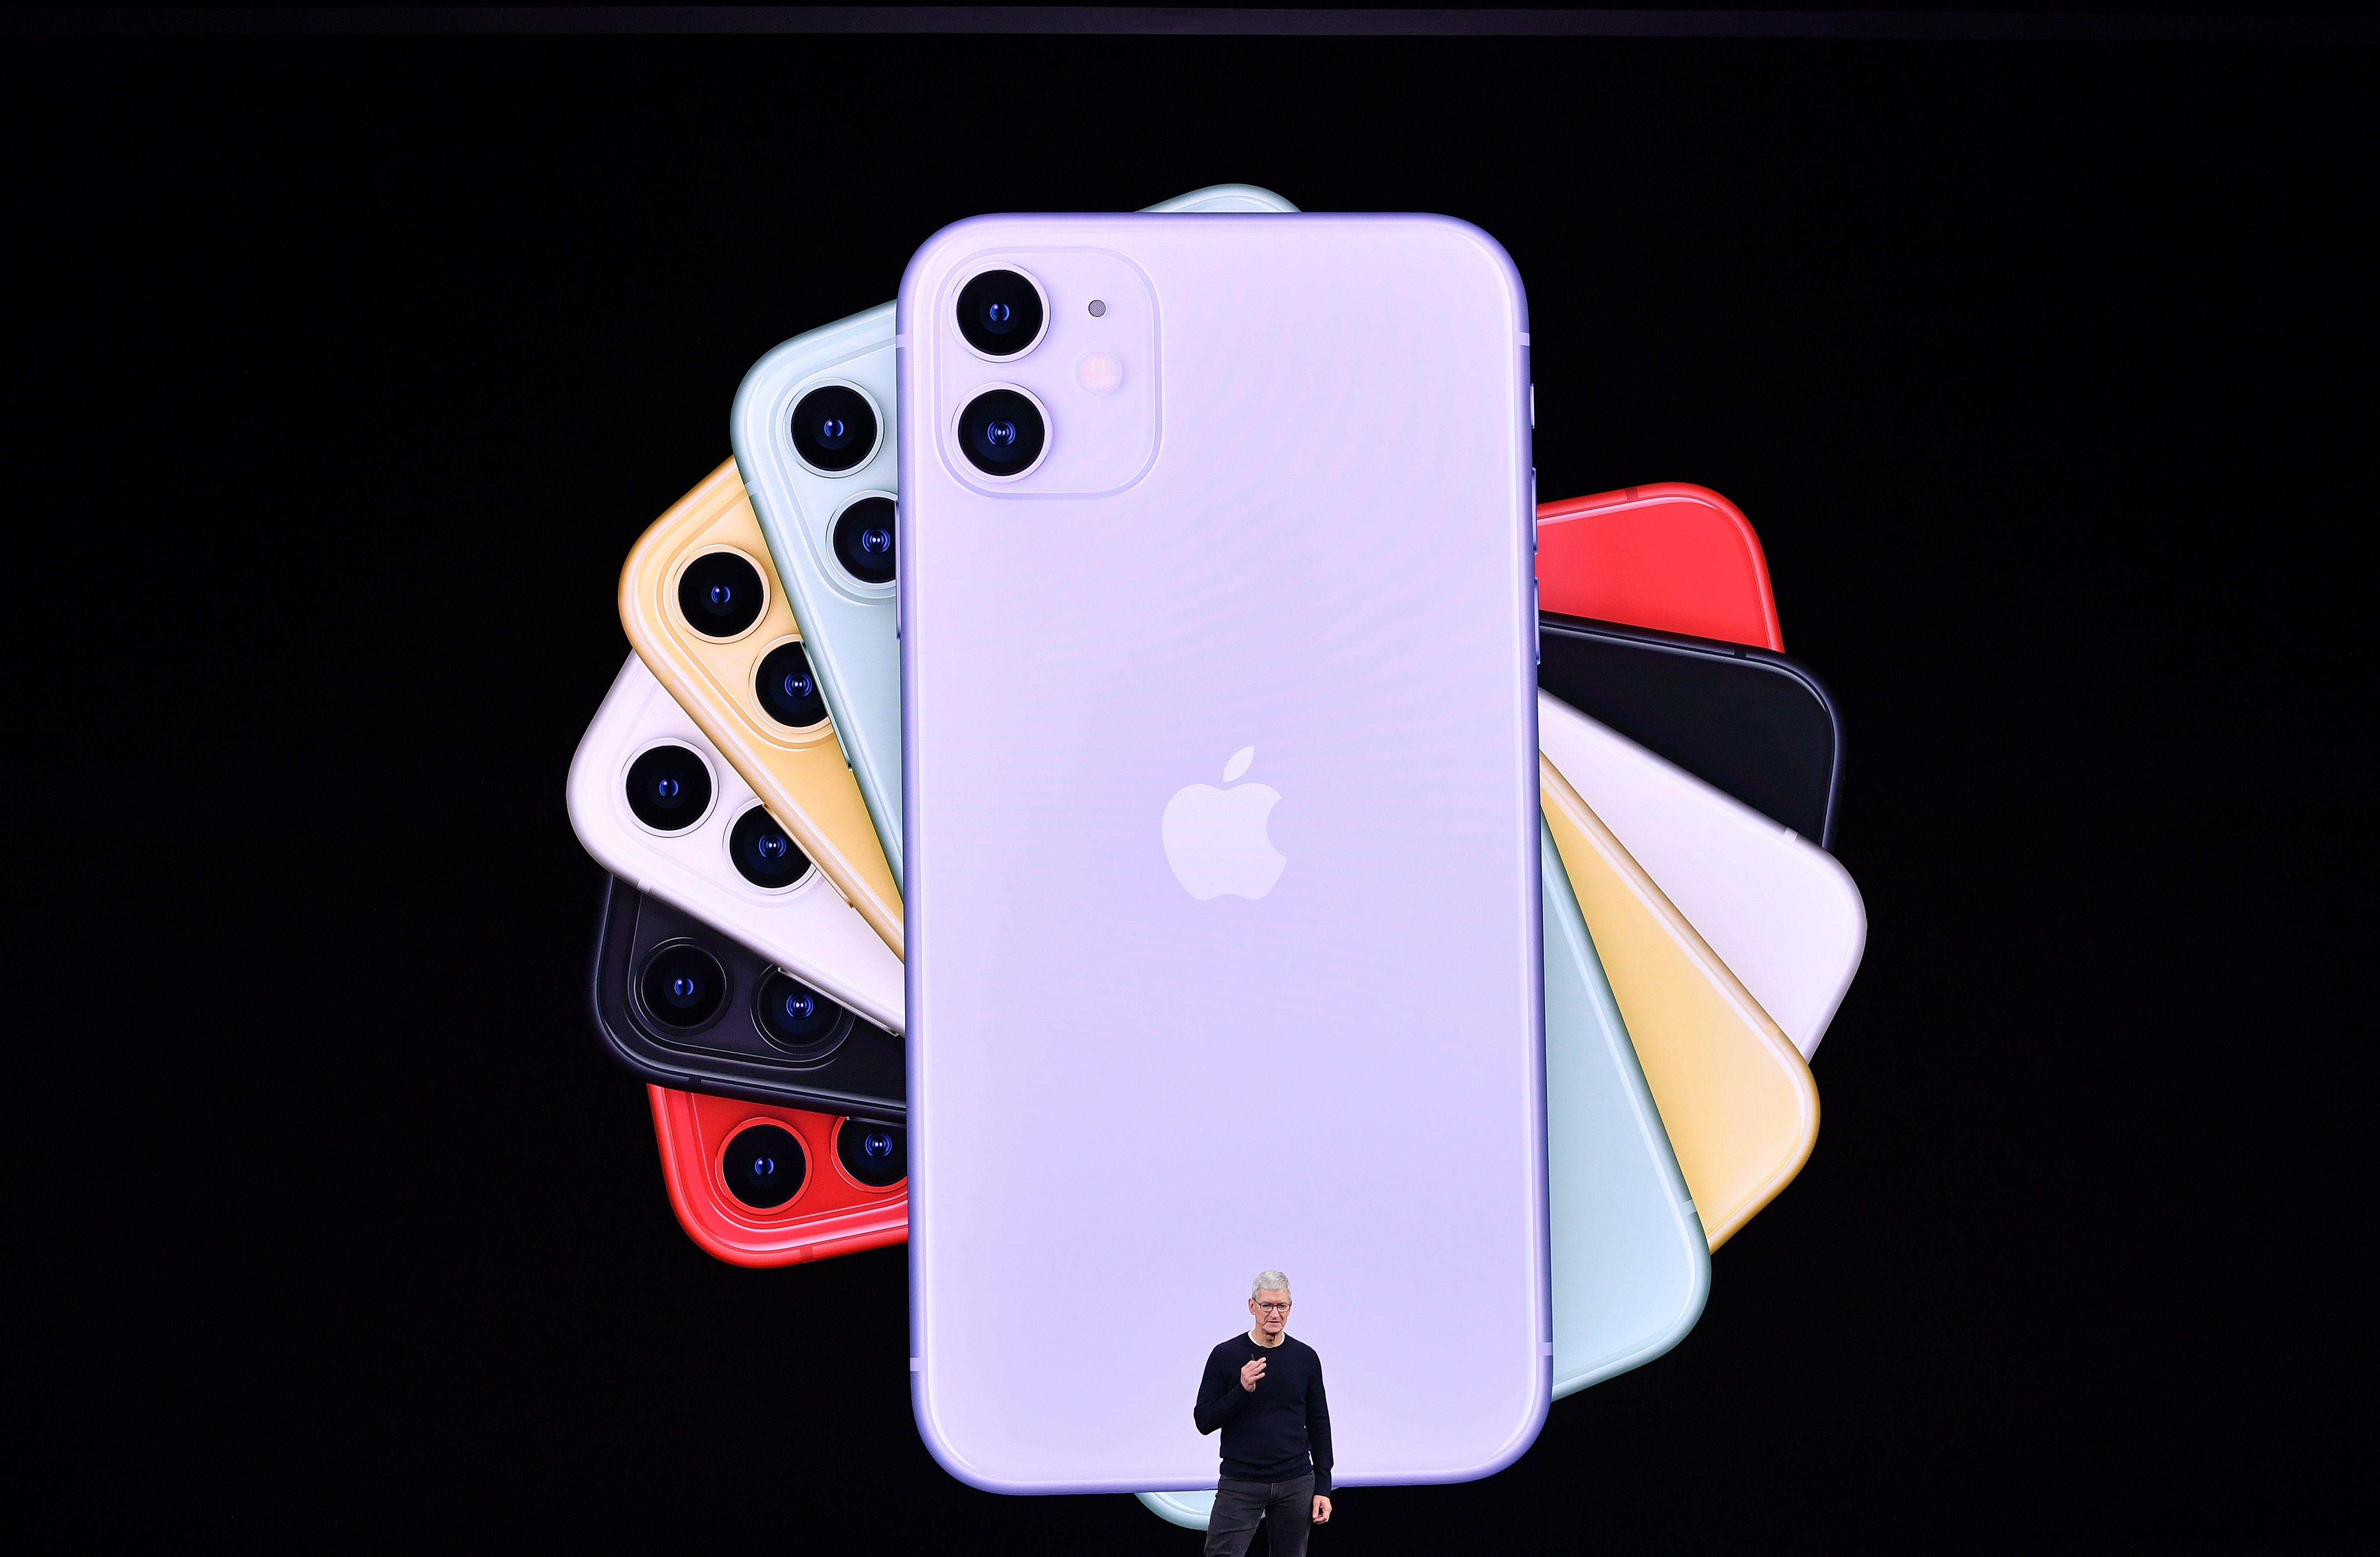 Apple lancia le nuove cover per iPhone 11 iPhone 11 Pro ed iPhone